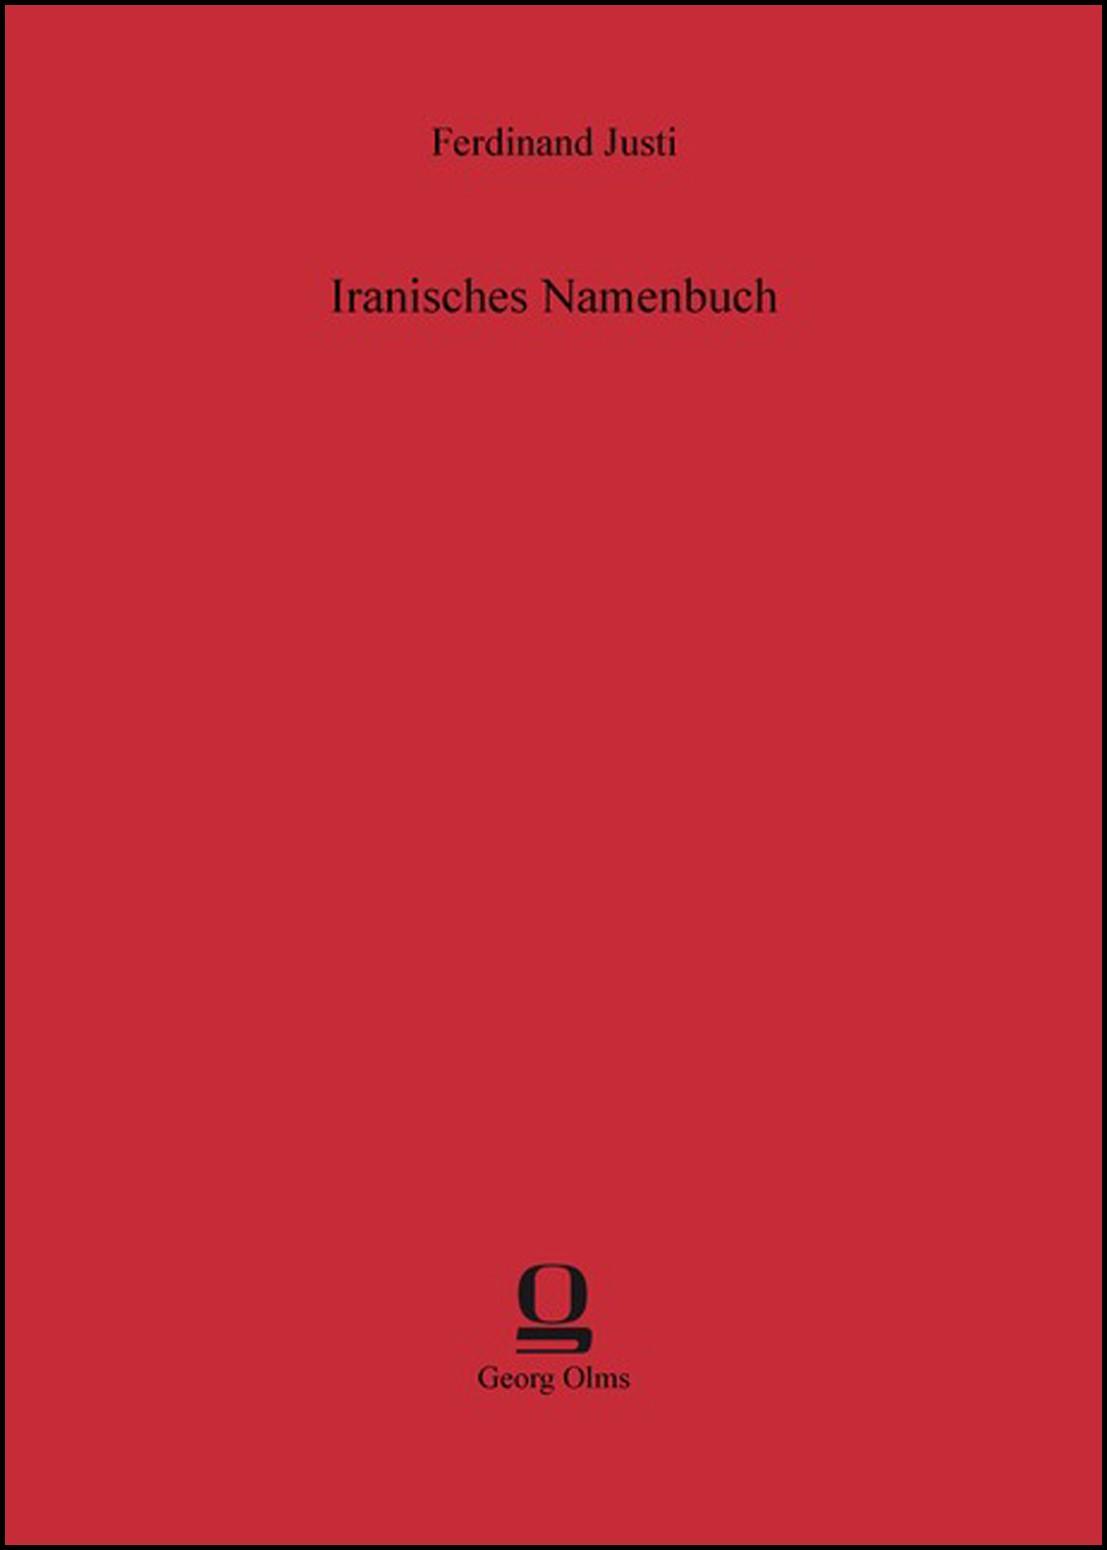 Iranisches Namenbuch | Justi, 2013 | Buch (Cover)